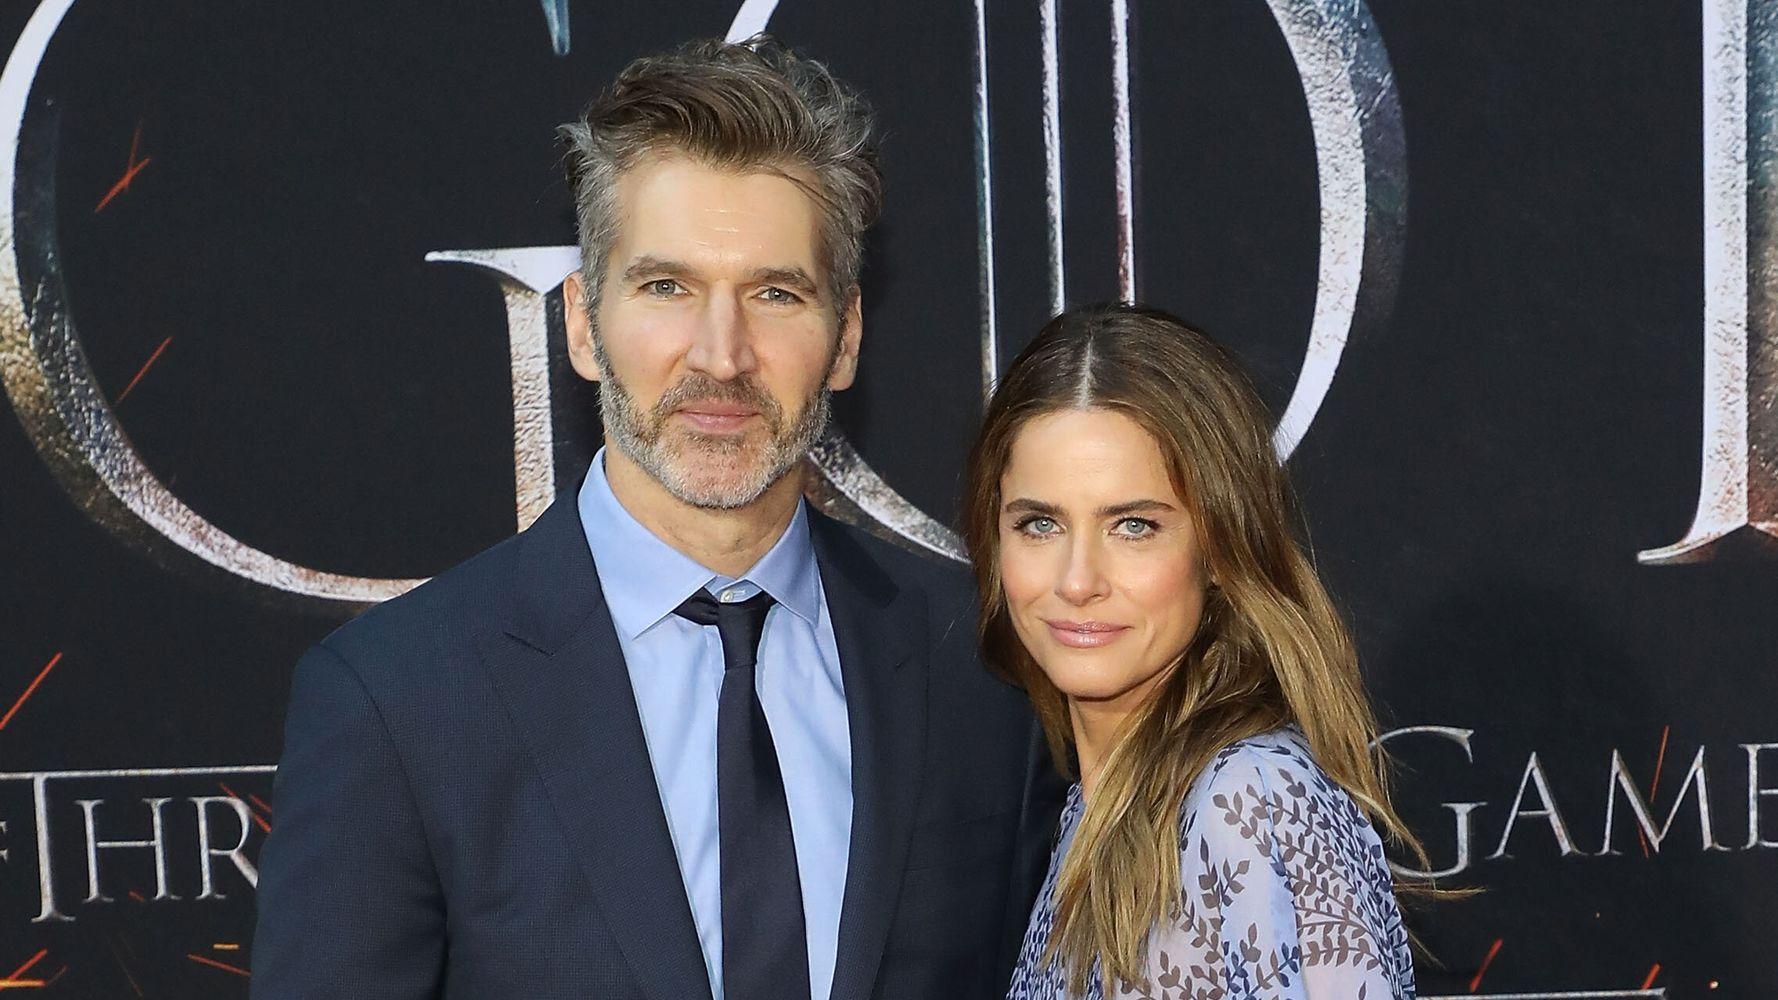 Amanda Peet Helped Her Husband Edit Game of Thrones Episodes